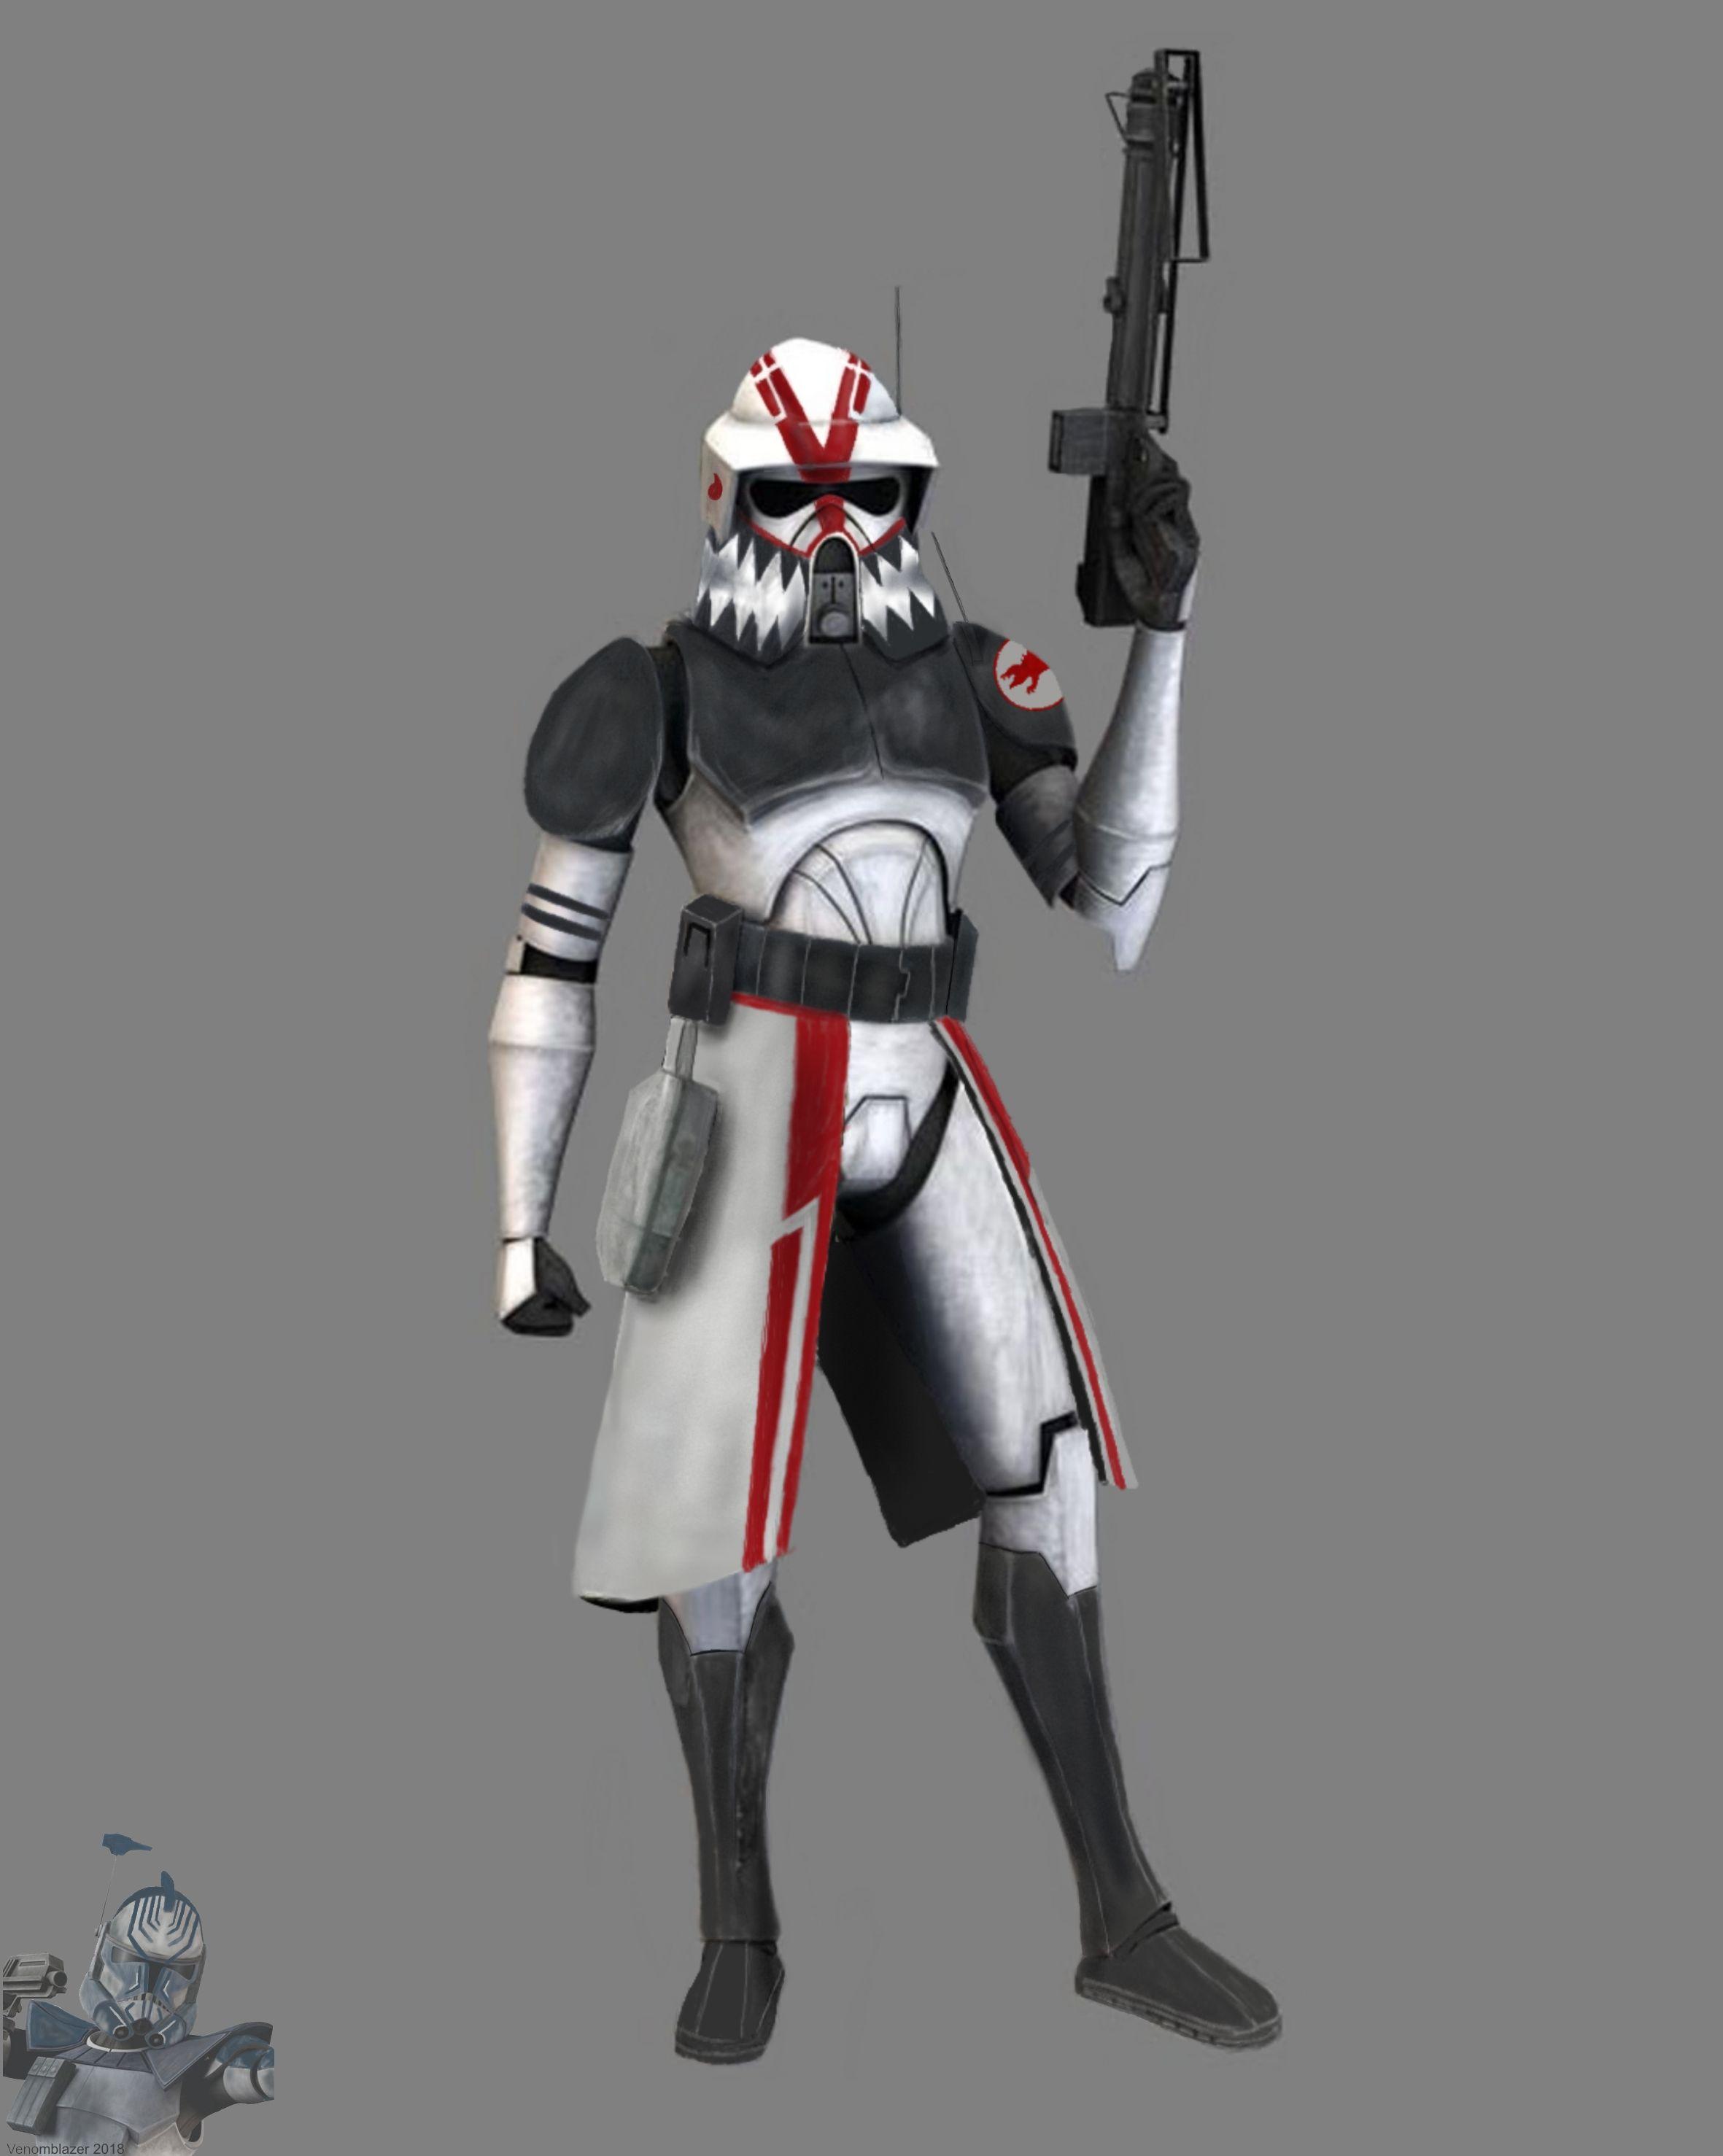 Arf Trooper Hound Star Wars Characters Pictures Star Wars Vehicles Star Wars Background